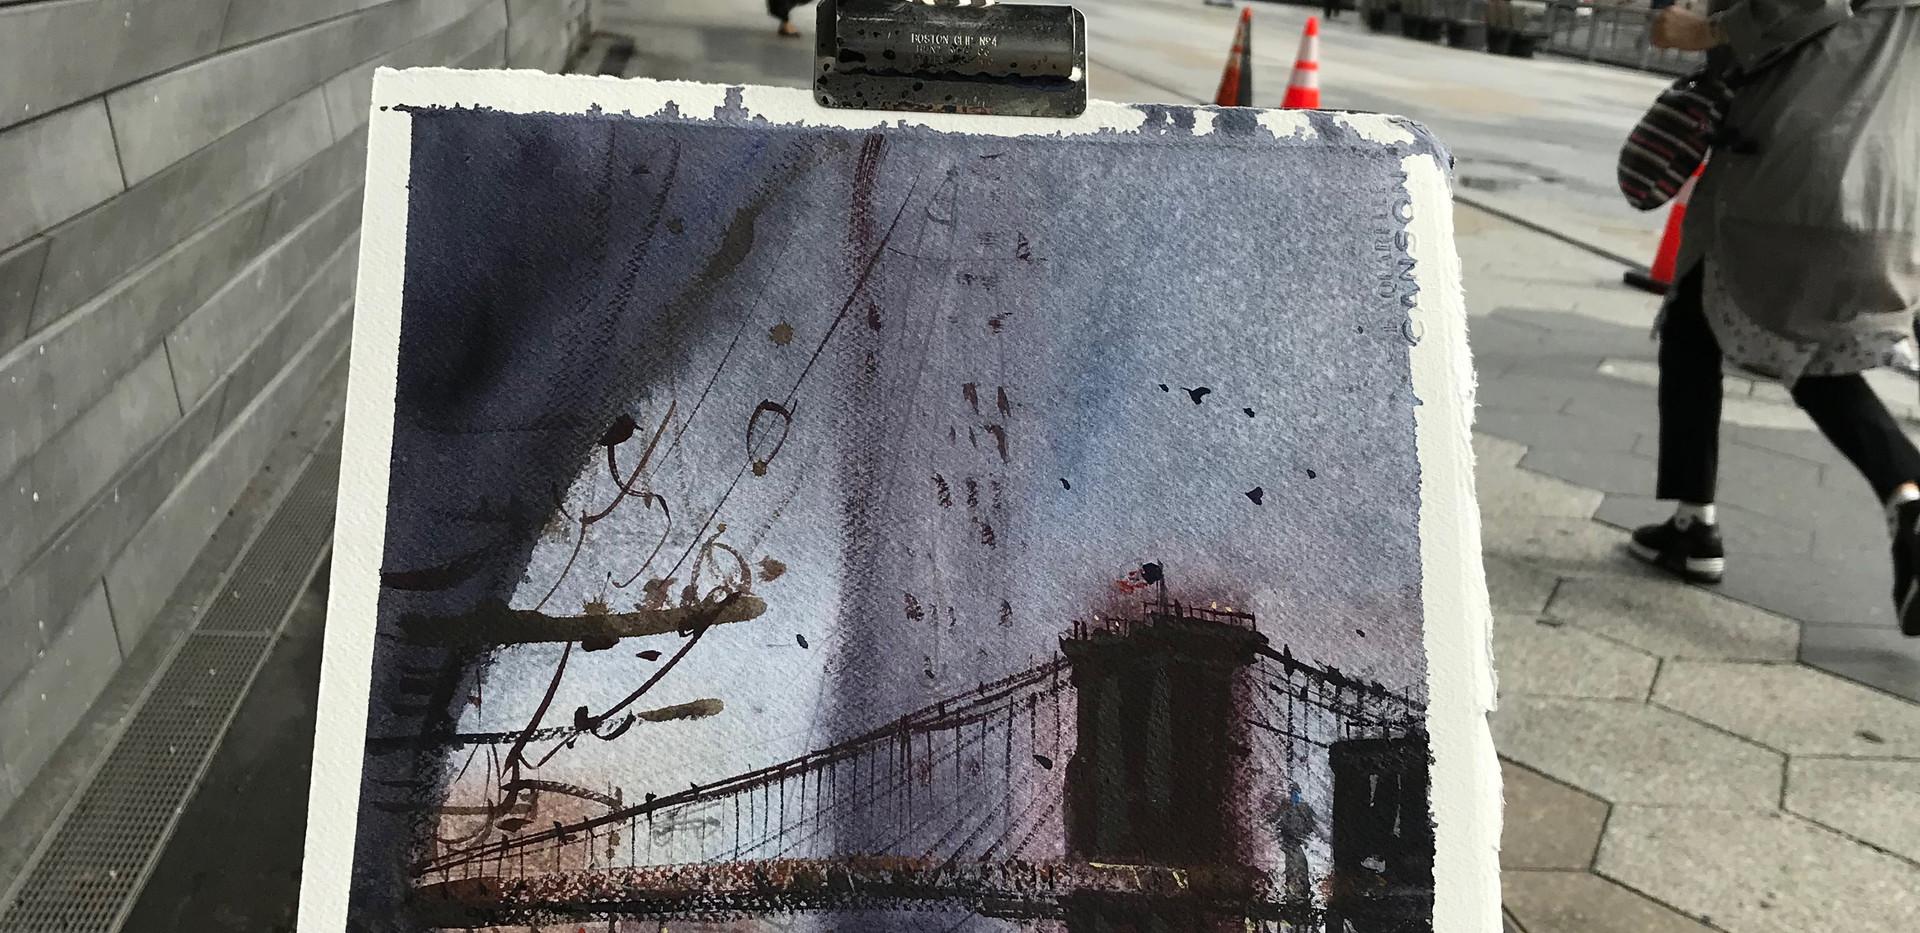 Brooklyn Bridge on rainy day